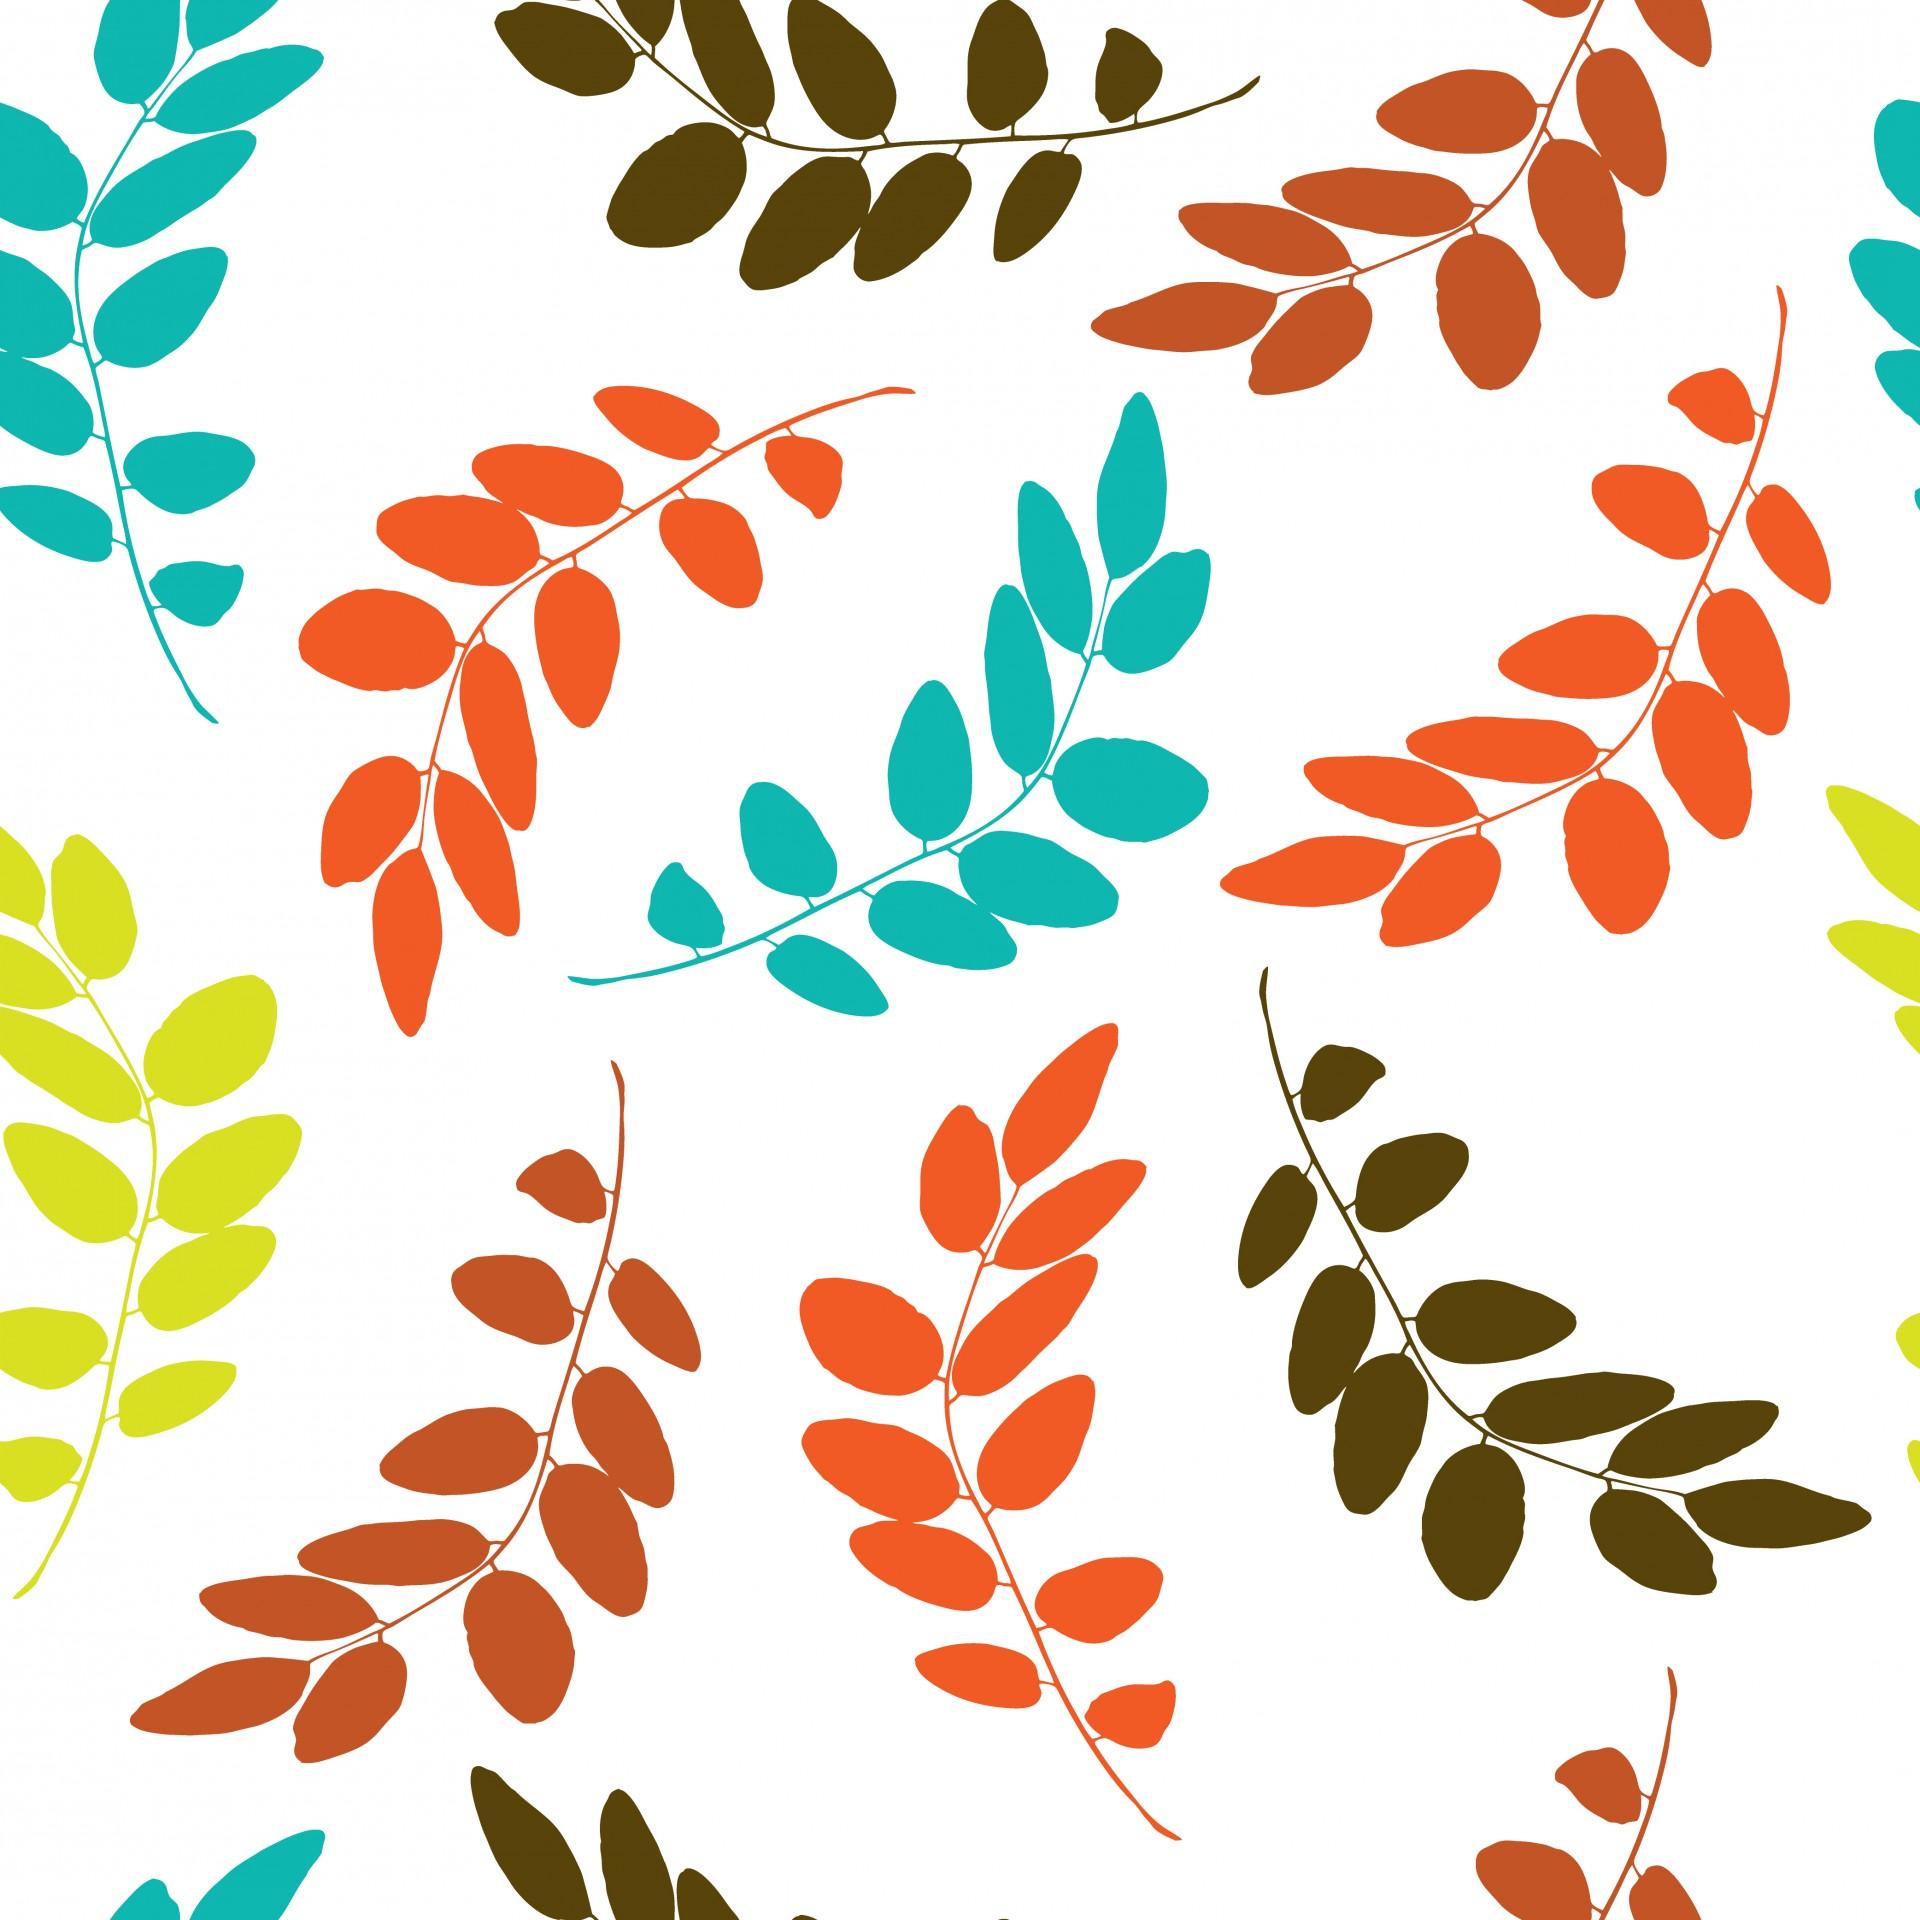 leaf pattern clipart - photo #35